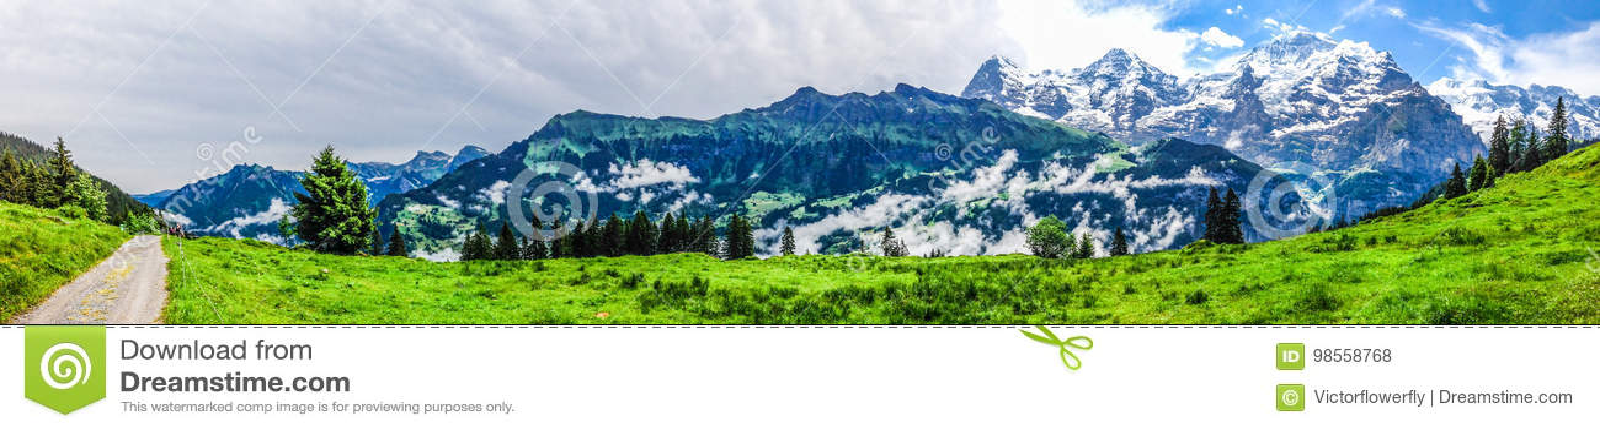 Beautiful Panorama view of Swiss Alps mountains from Murren